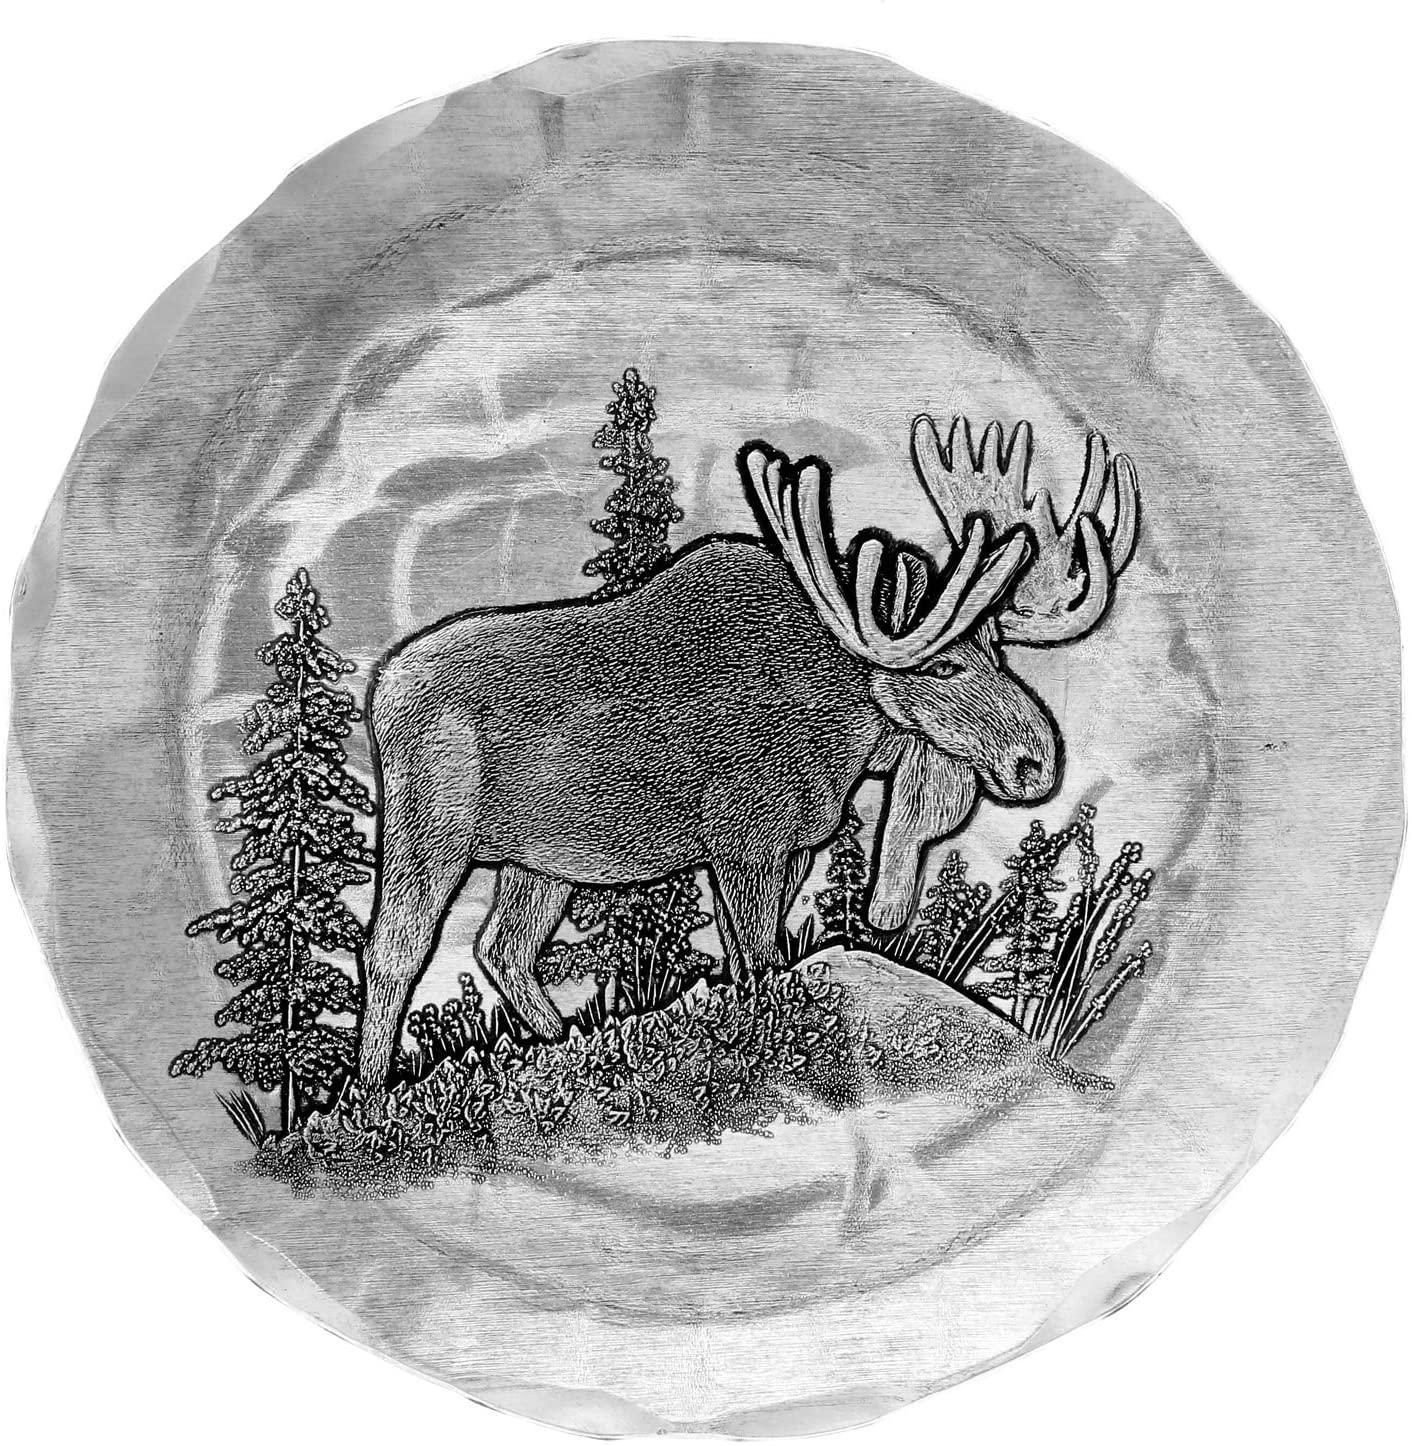 Woodland Animal Metal Coaster, Handmade in the USA, Keeps Tabletops Safe (Moose)